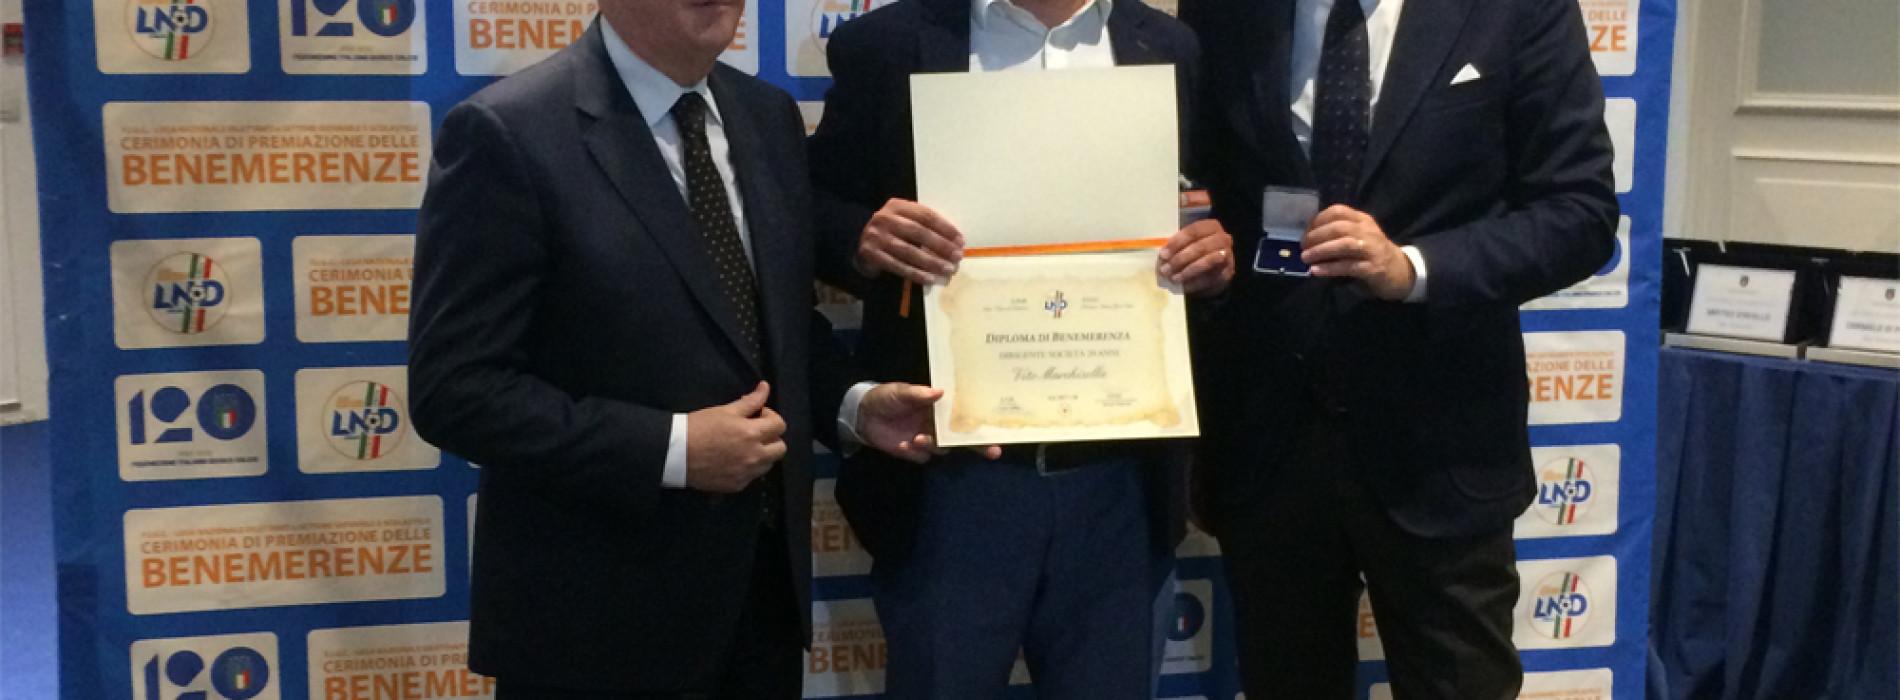 Benemerenze: premiati a Roma dirigenti e società